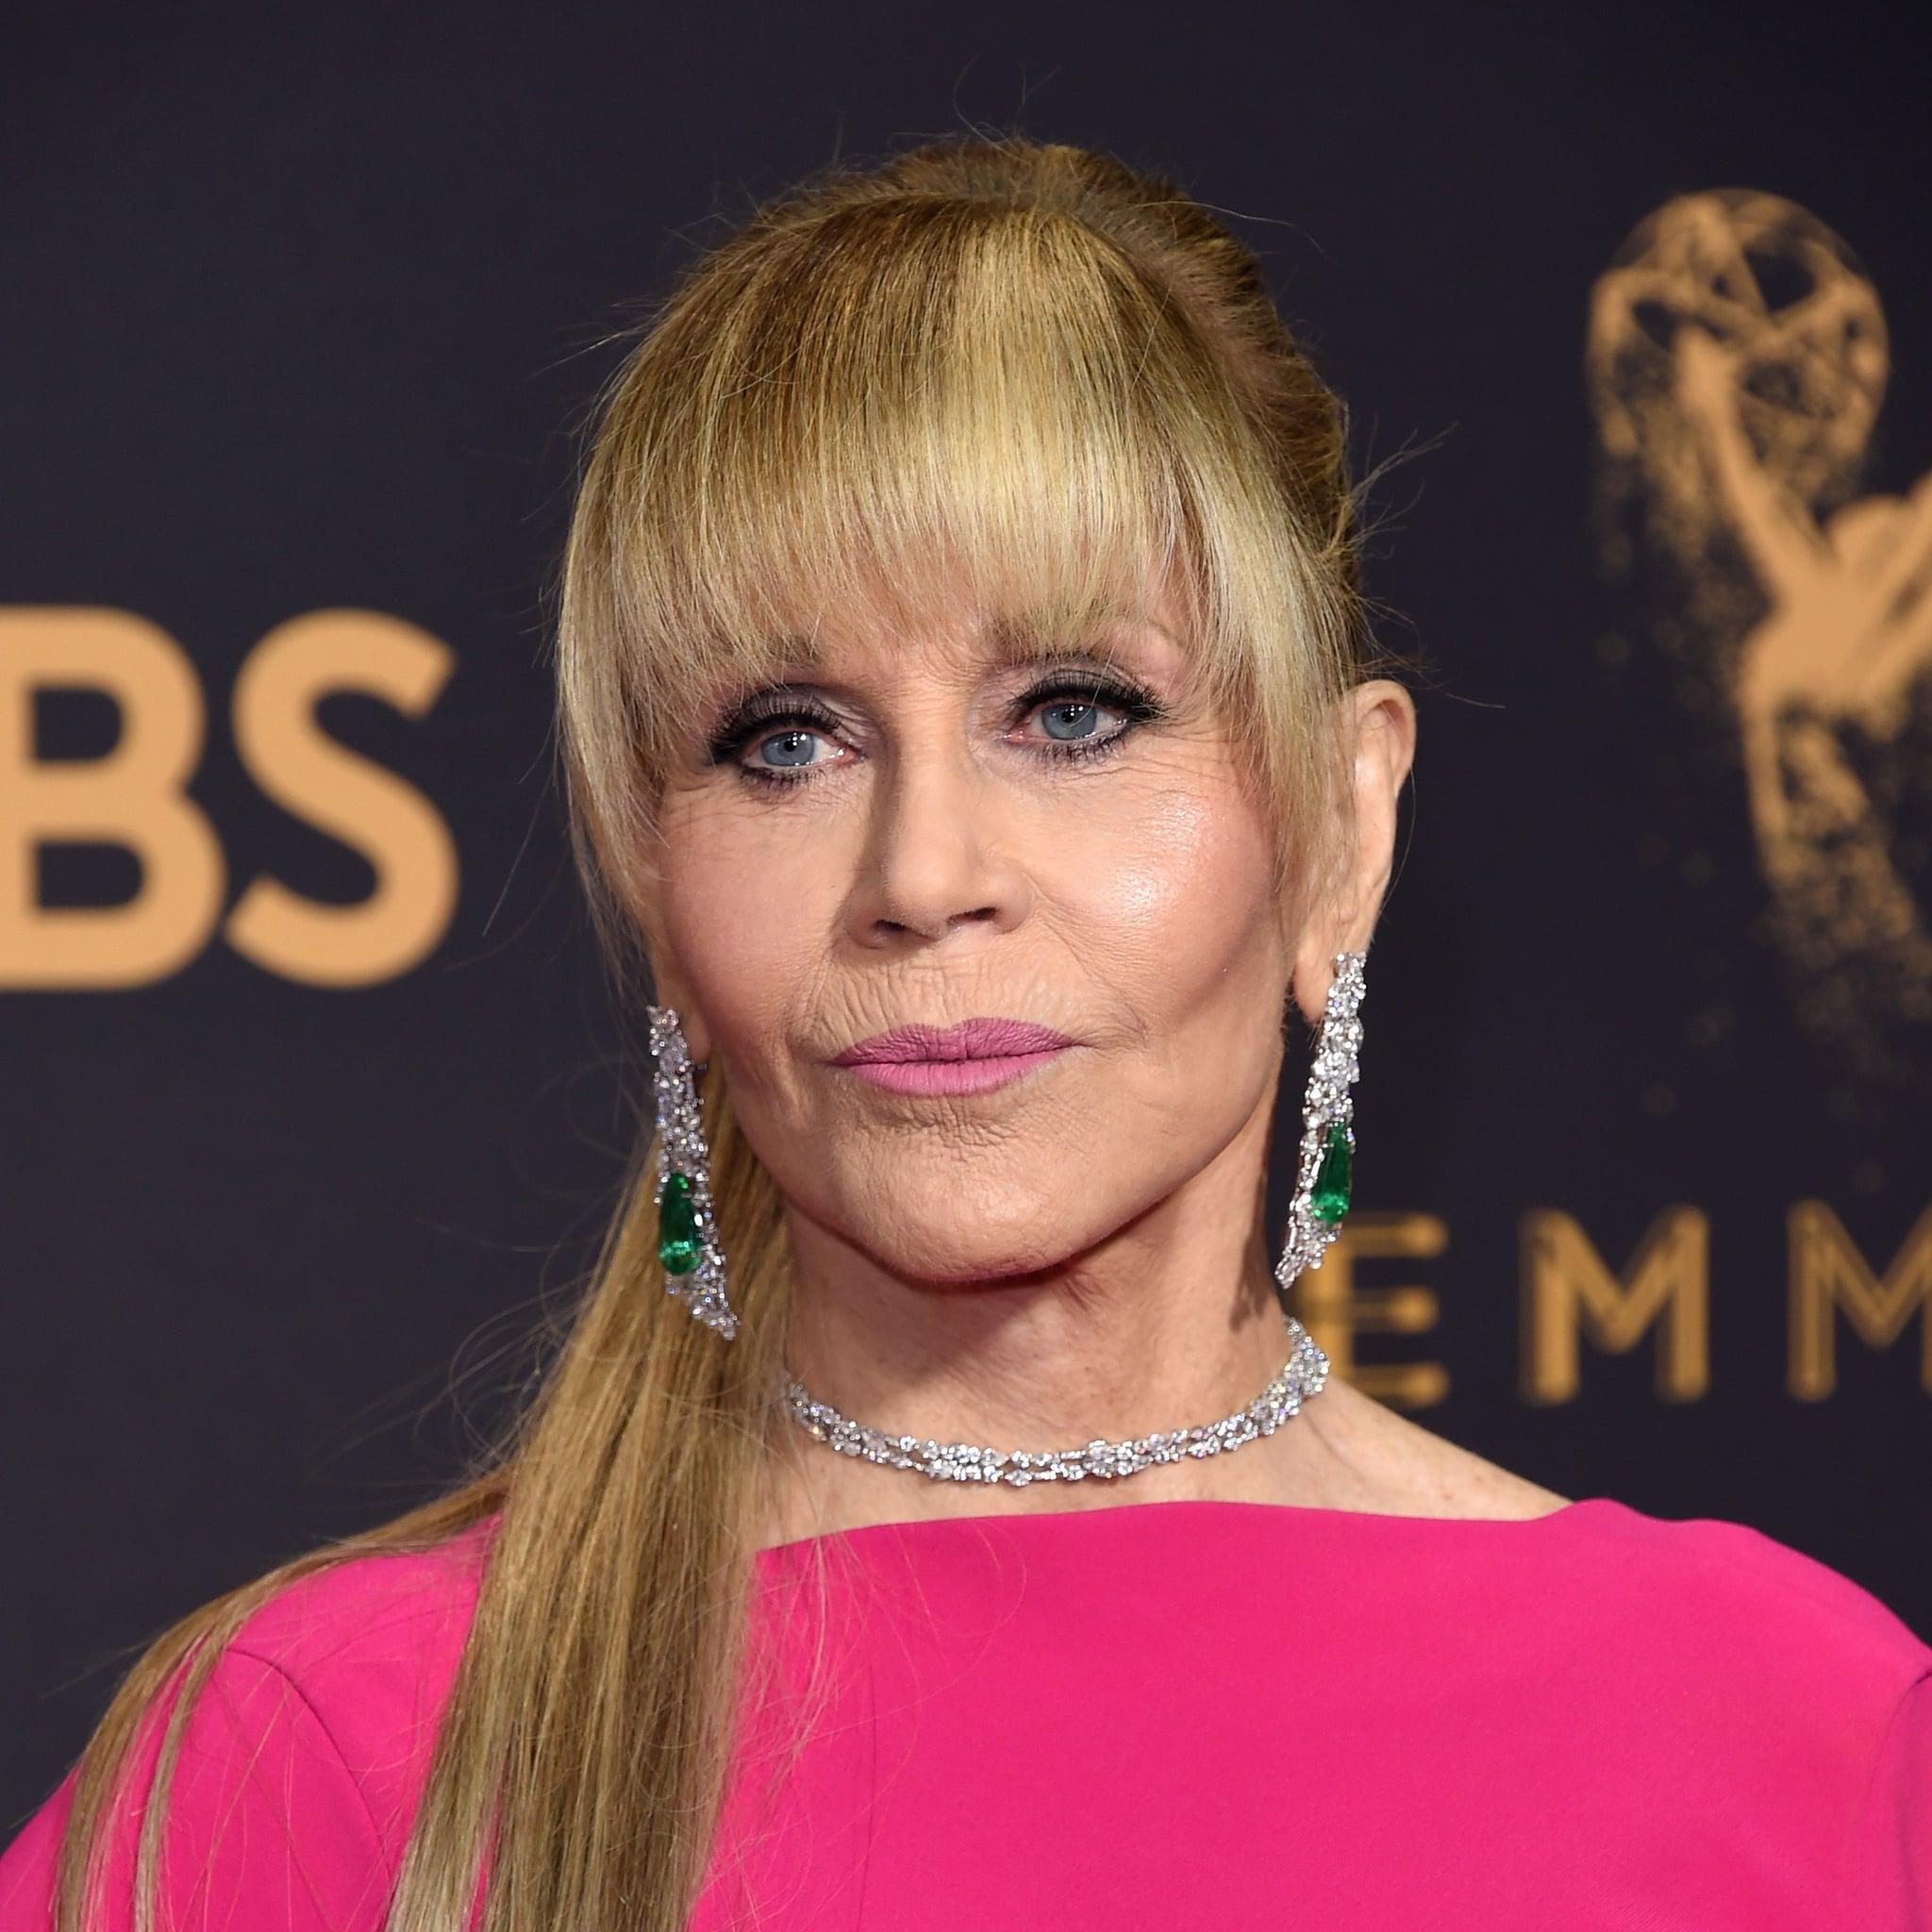 Jane Fonda\u0027s Hair at the 2017 Emmy Awards | POPSUGAR Beauty